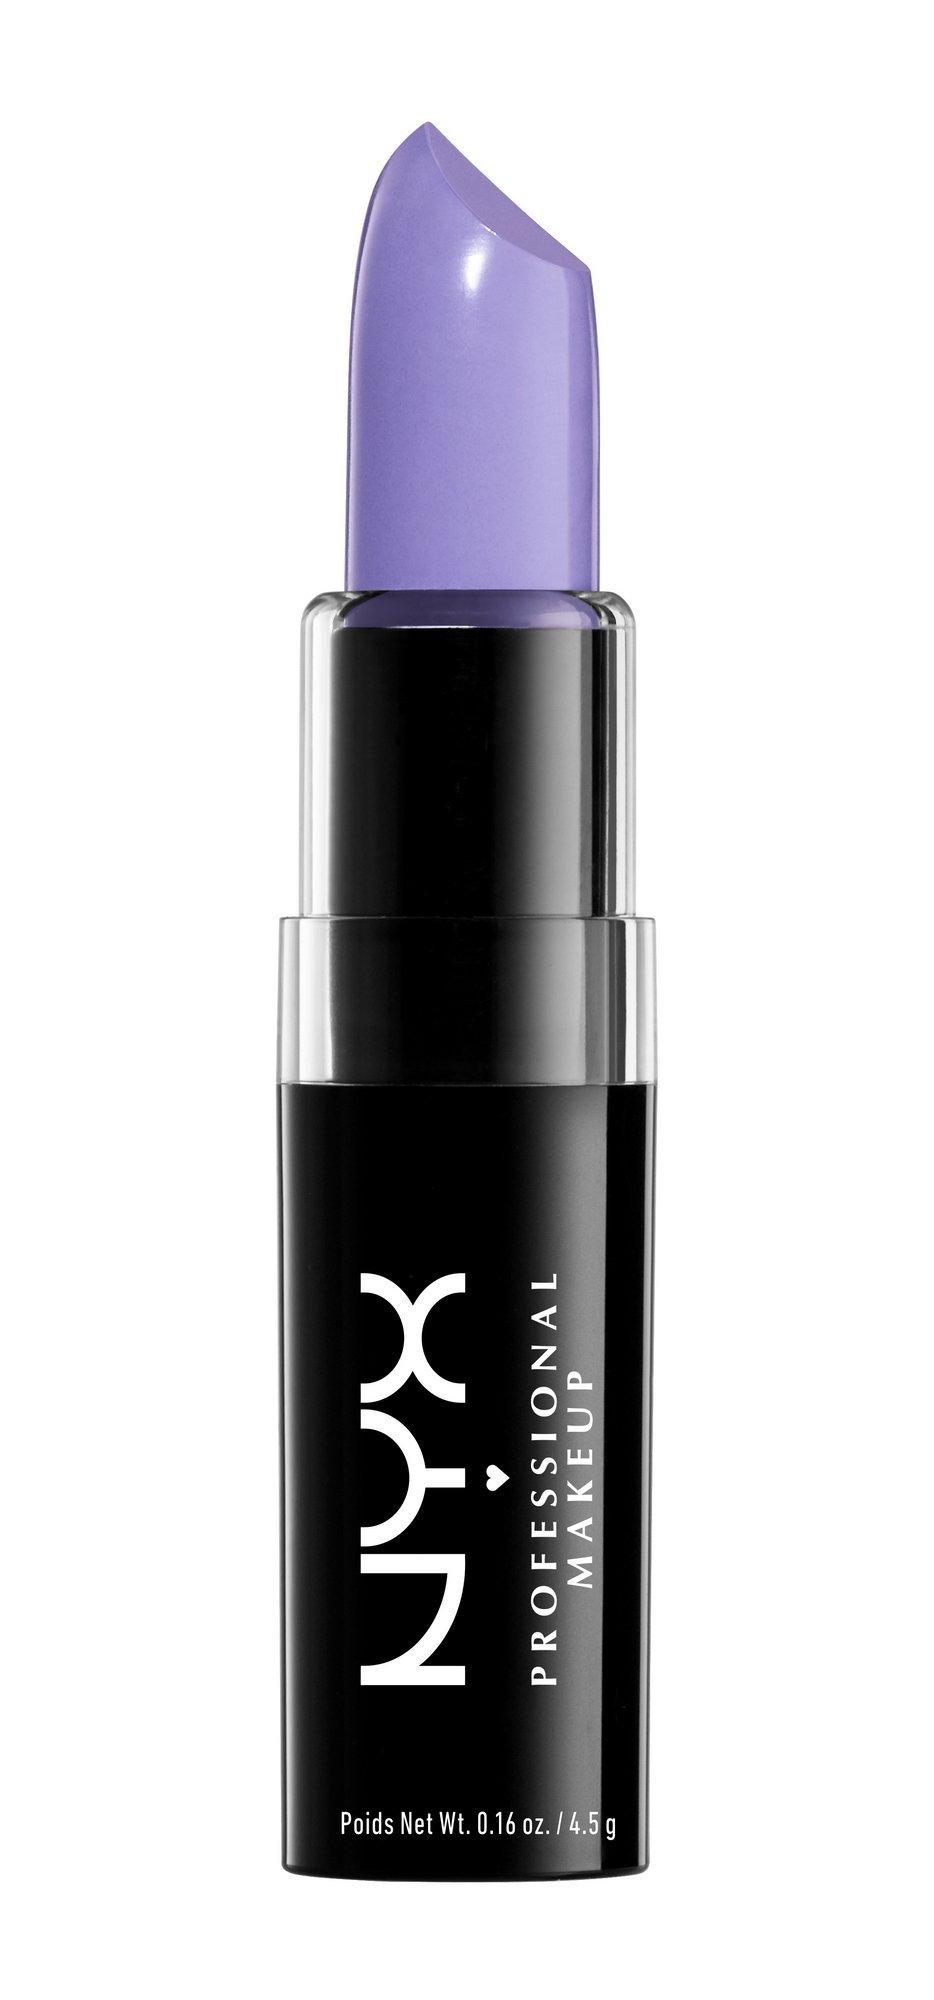 "NYX Macaron Pastel Lippies Lipstick - Lavender : MALS09 ""Lavender"" 0.16 oz."